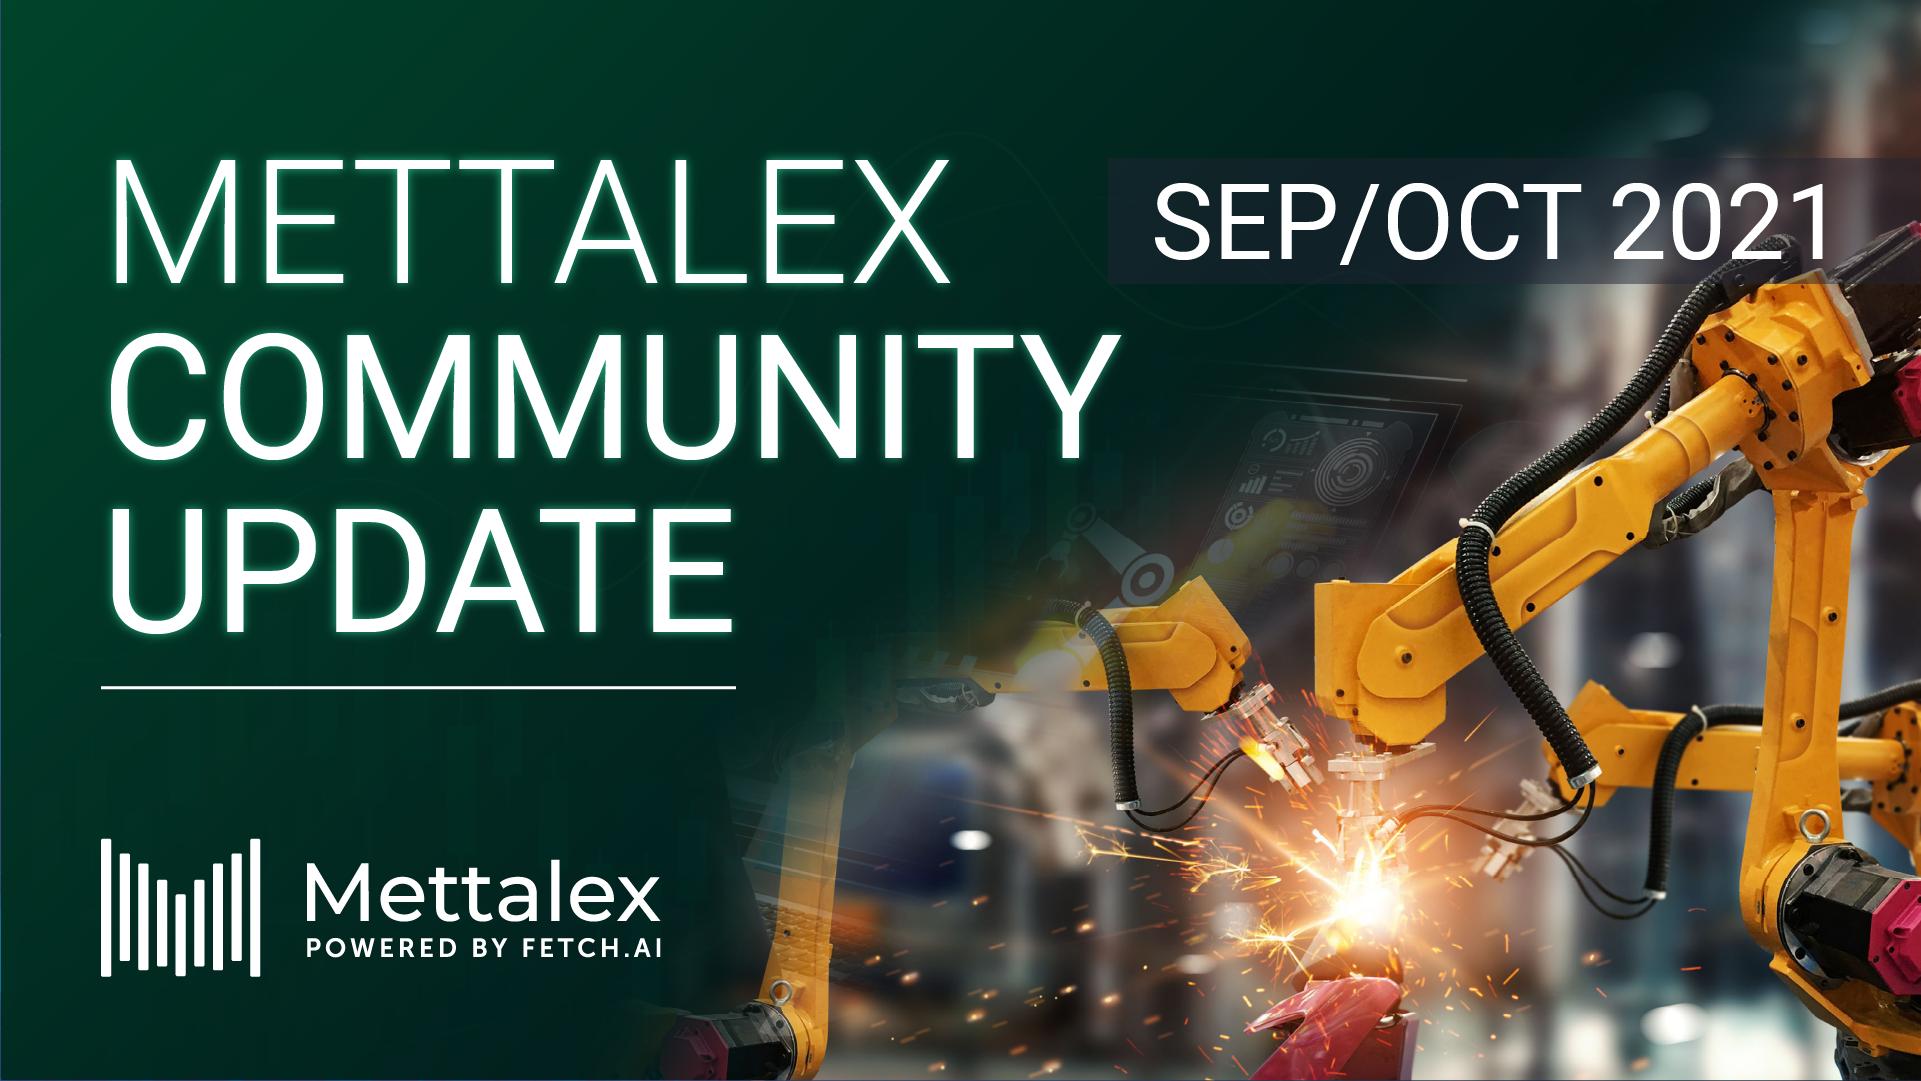 https://mettalex.com/wp-content/uploads/Mettalex-Community-Update-Sep-Oct-2021.png